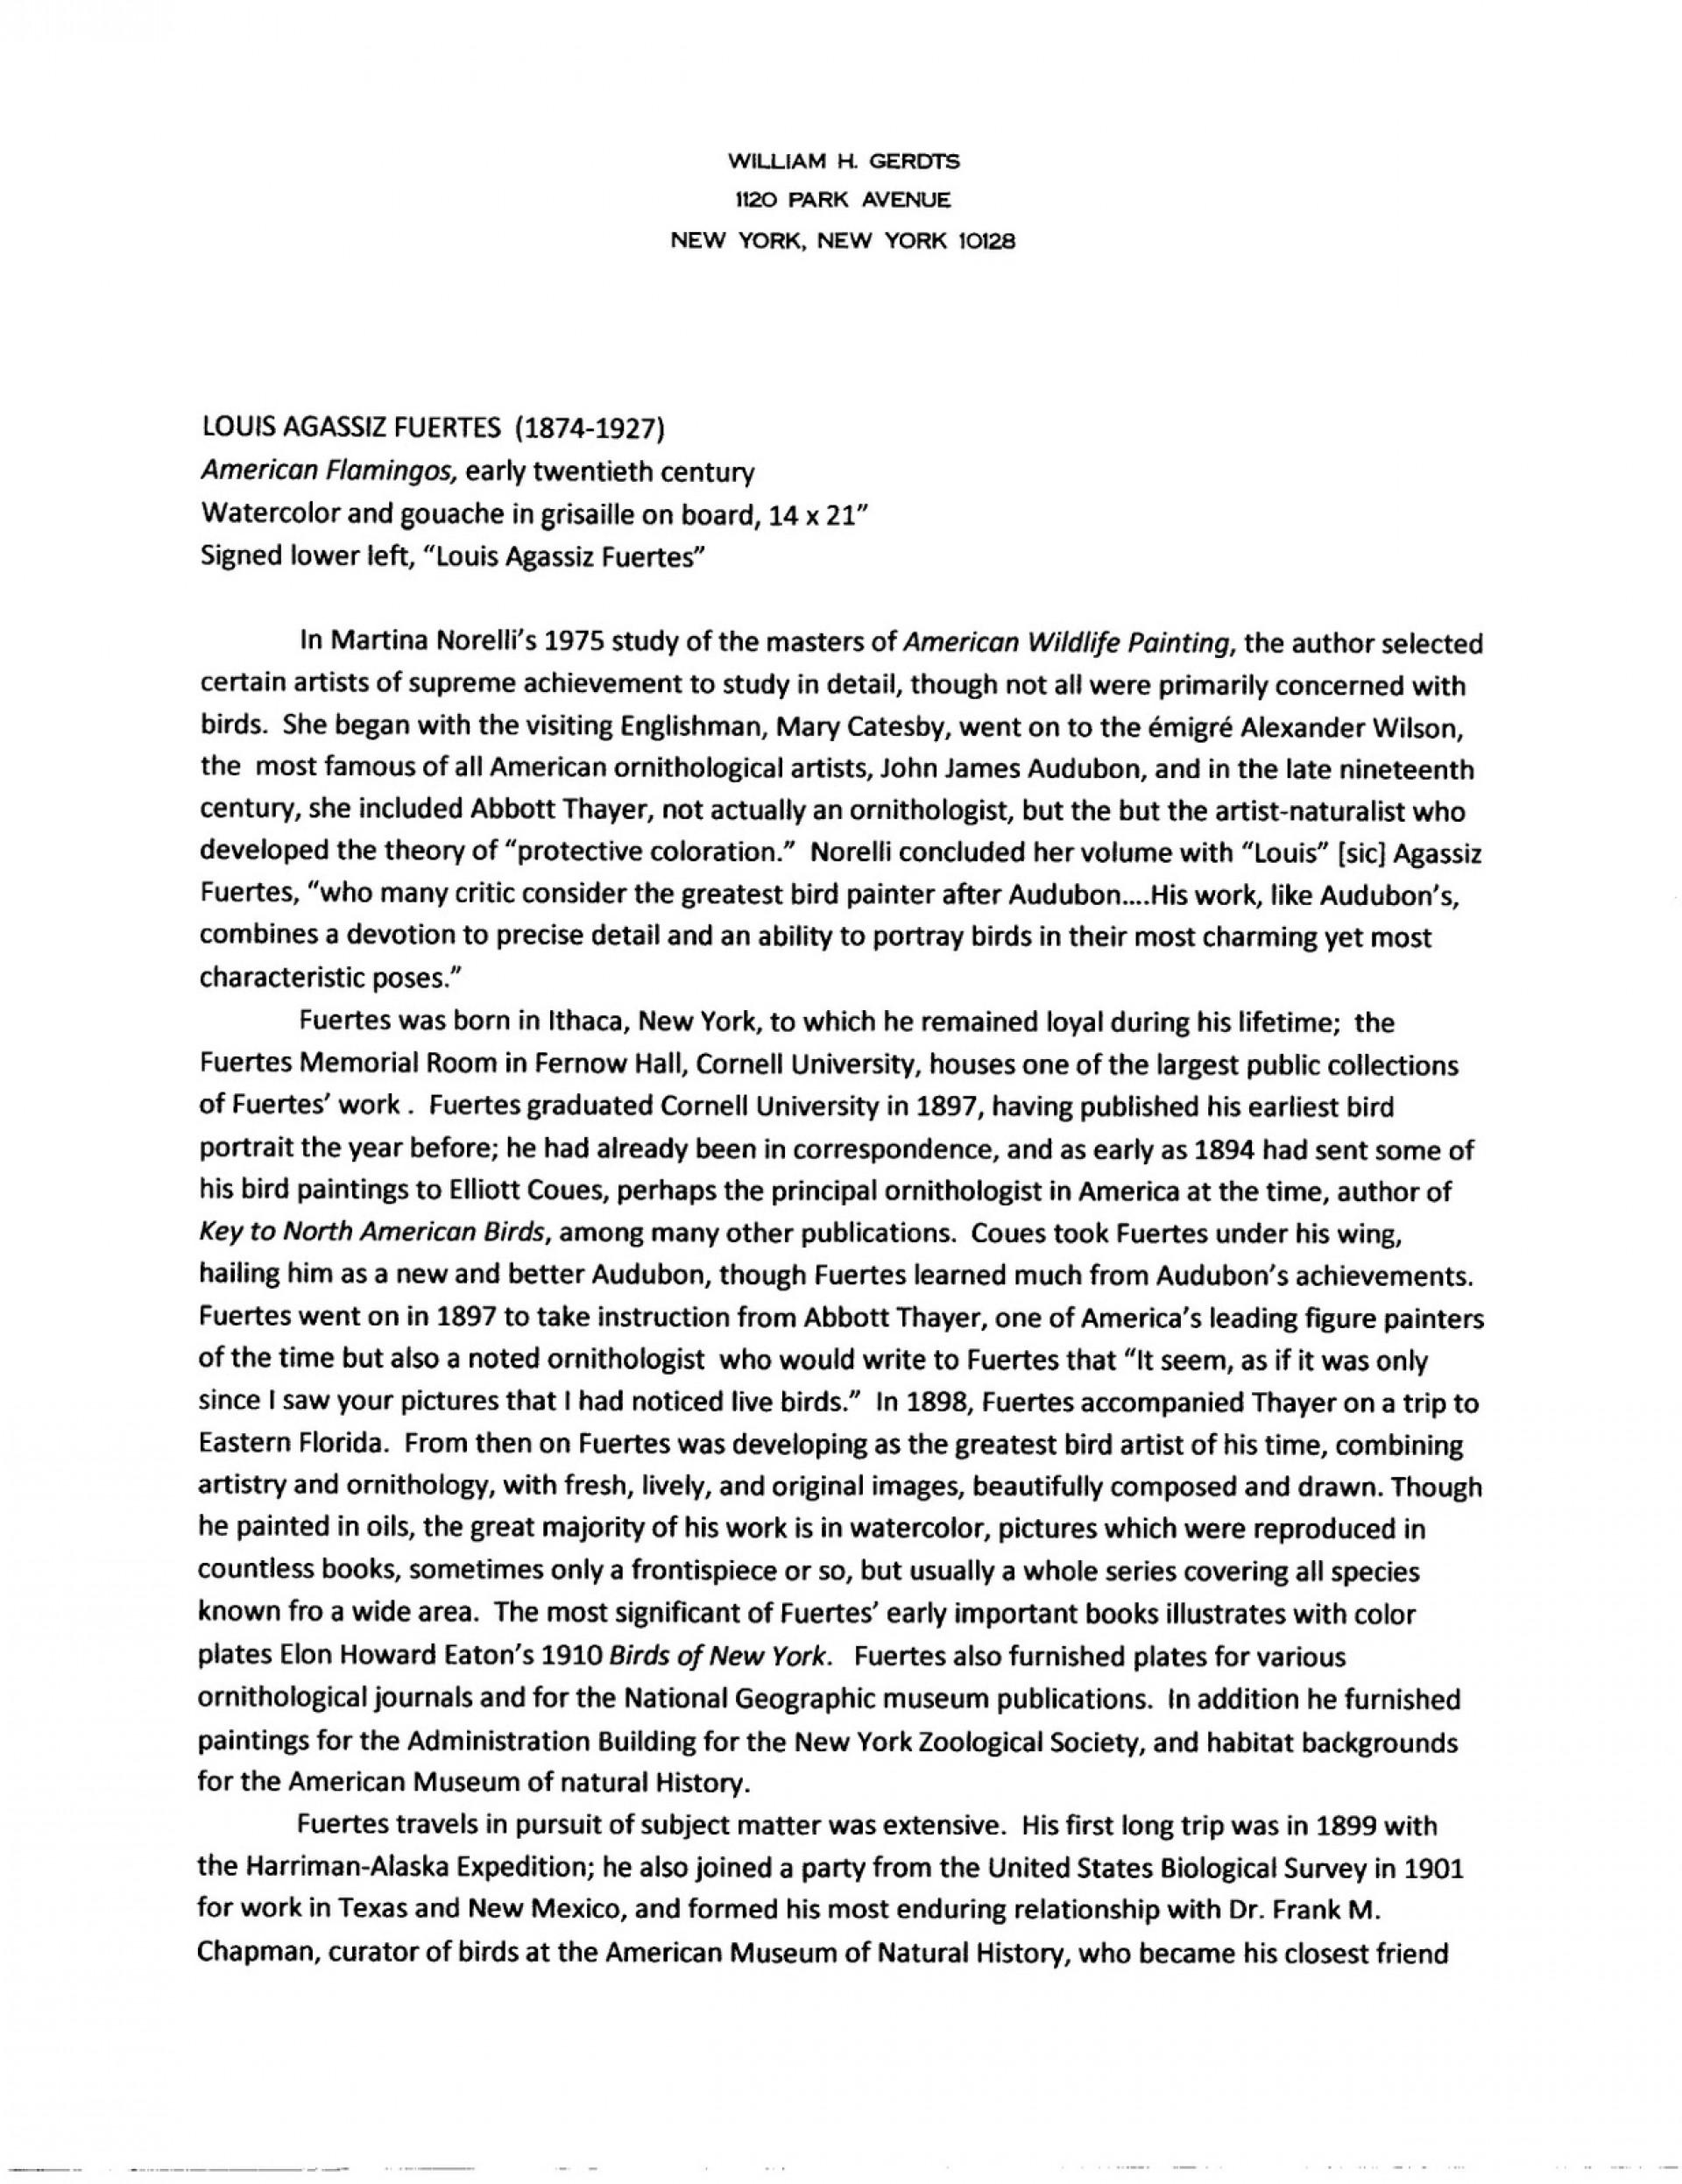 001 Fuertes20american20flamingos20001 Essay Example Grad Stupendous School Tips Graduate Speech Pathology Admission Format 1920